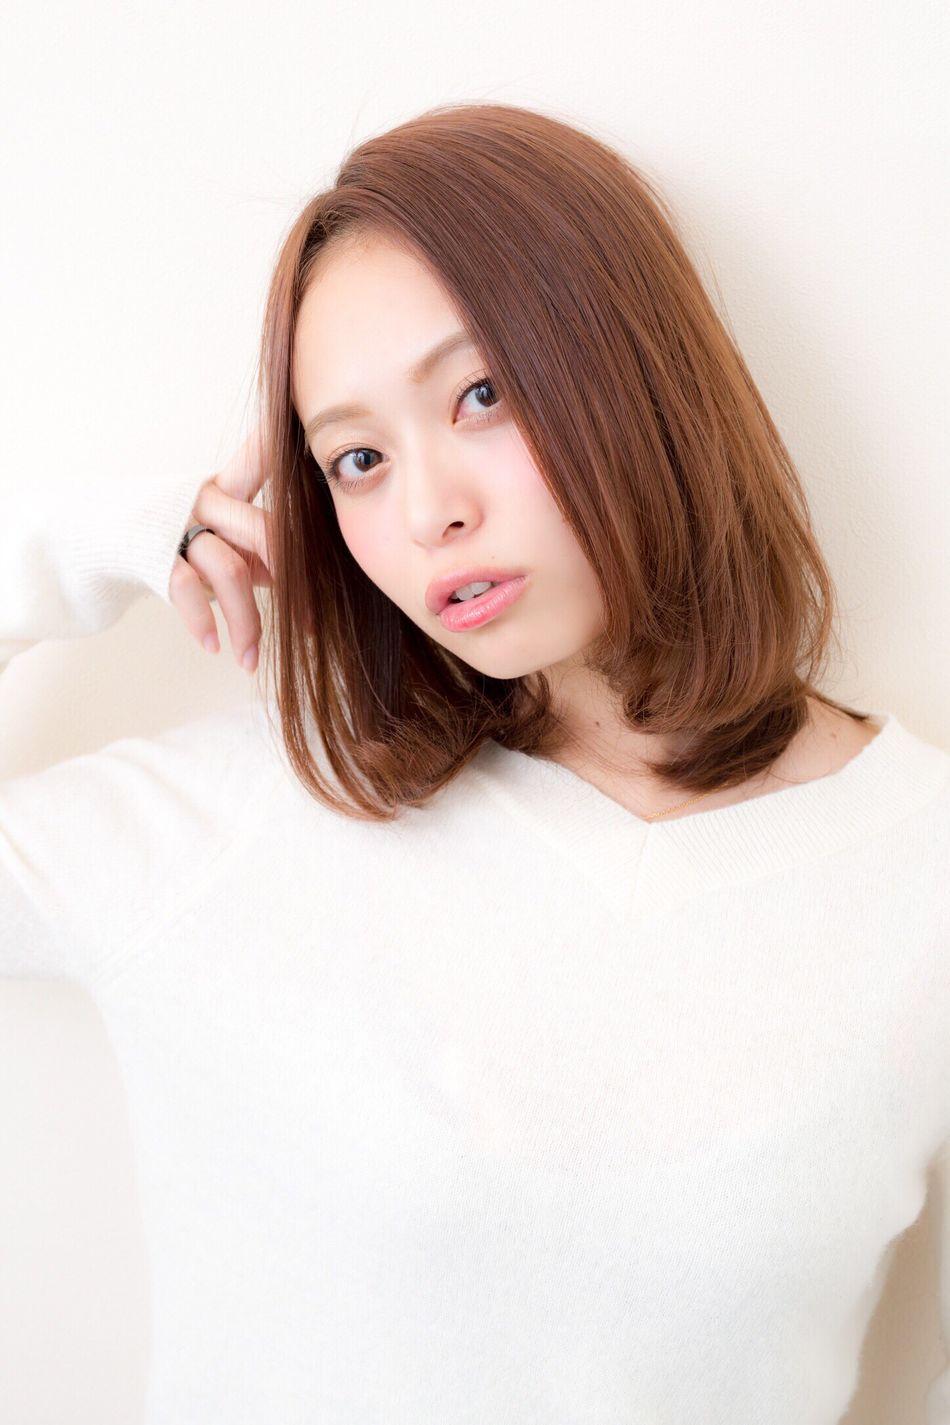 Hairstyle Kokubutoshinobu Japanese Girl Japan Beauty Beauty Girl Hair 箕面 サロンモデル 美容室 Natural Light Portrait